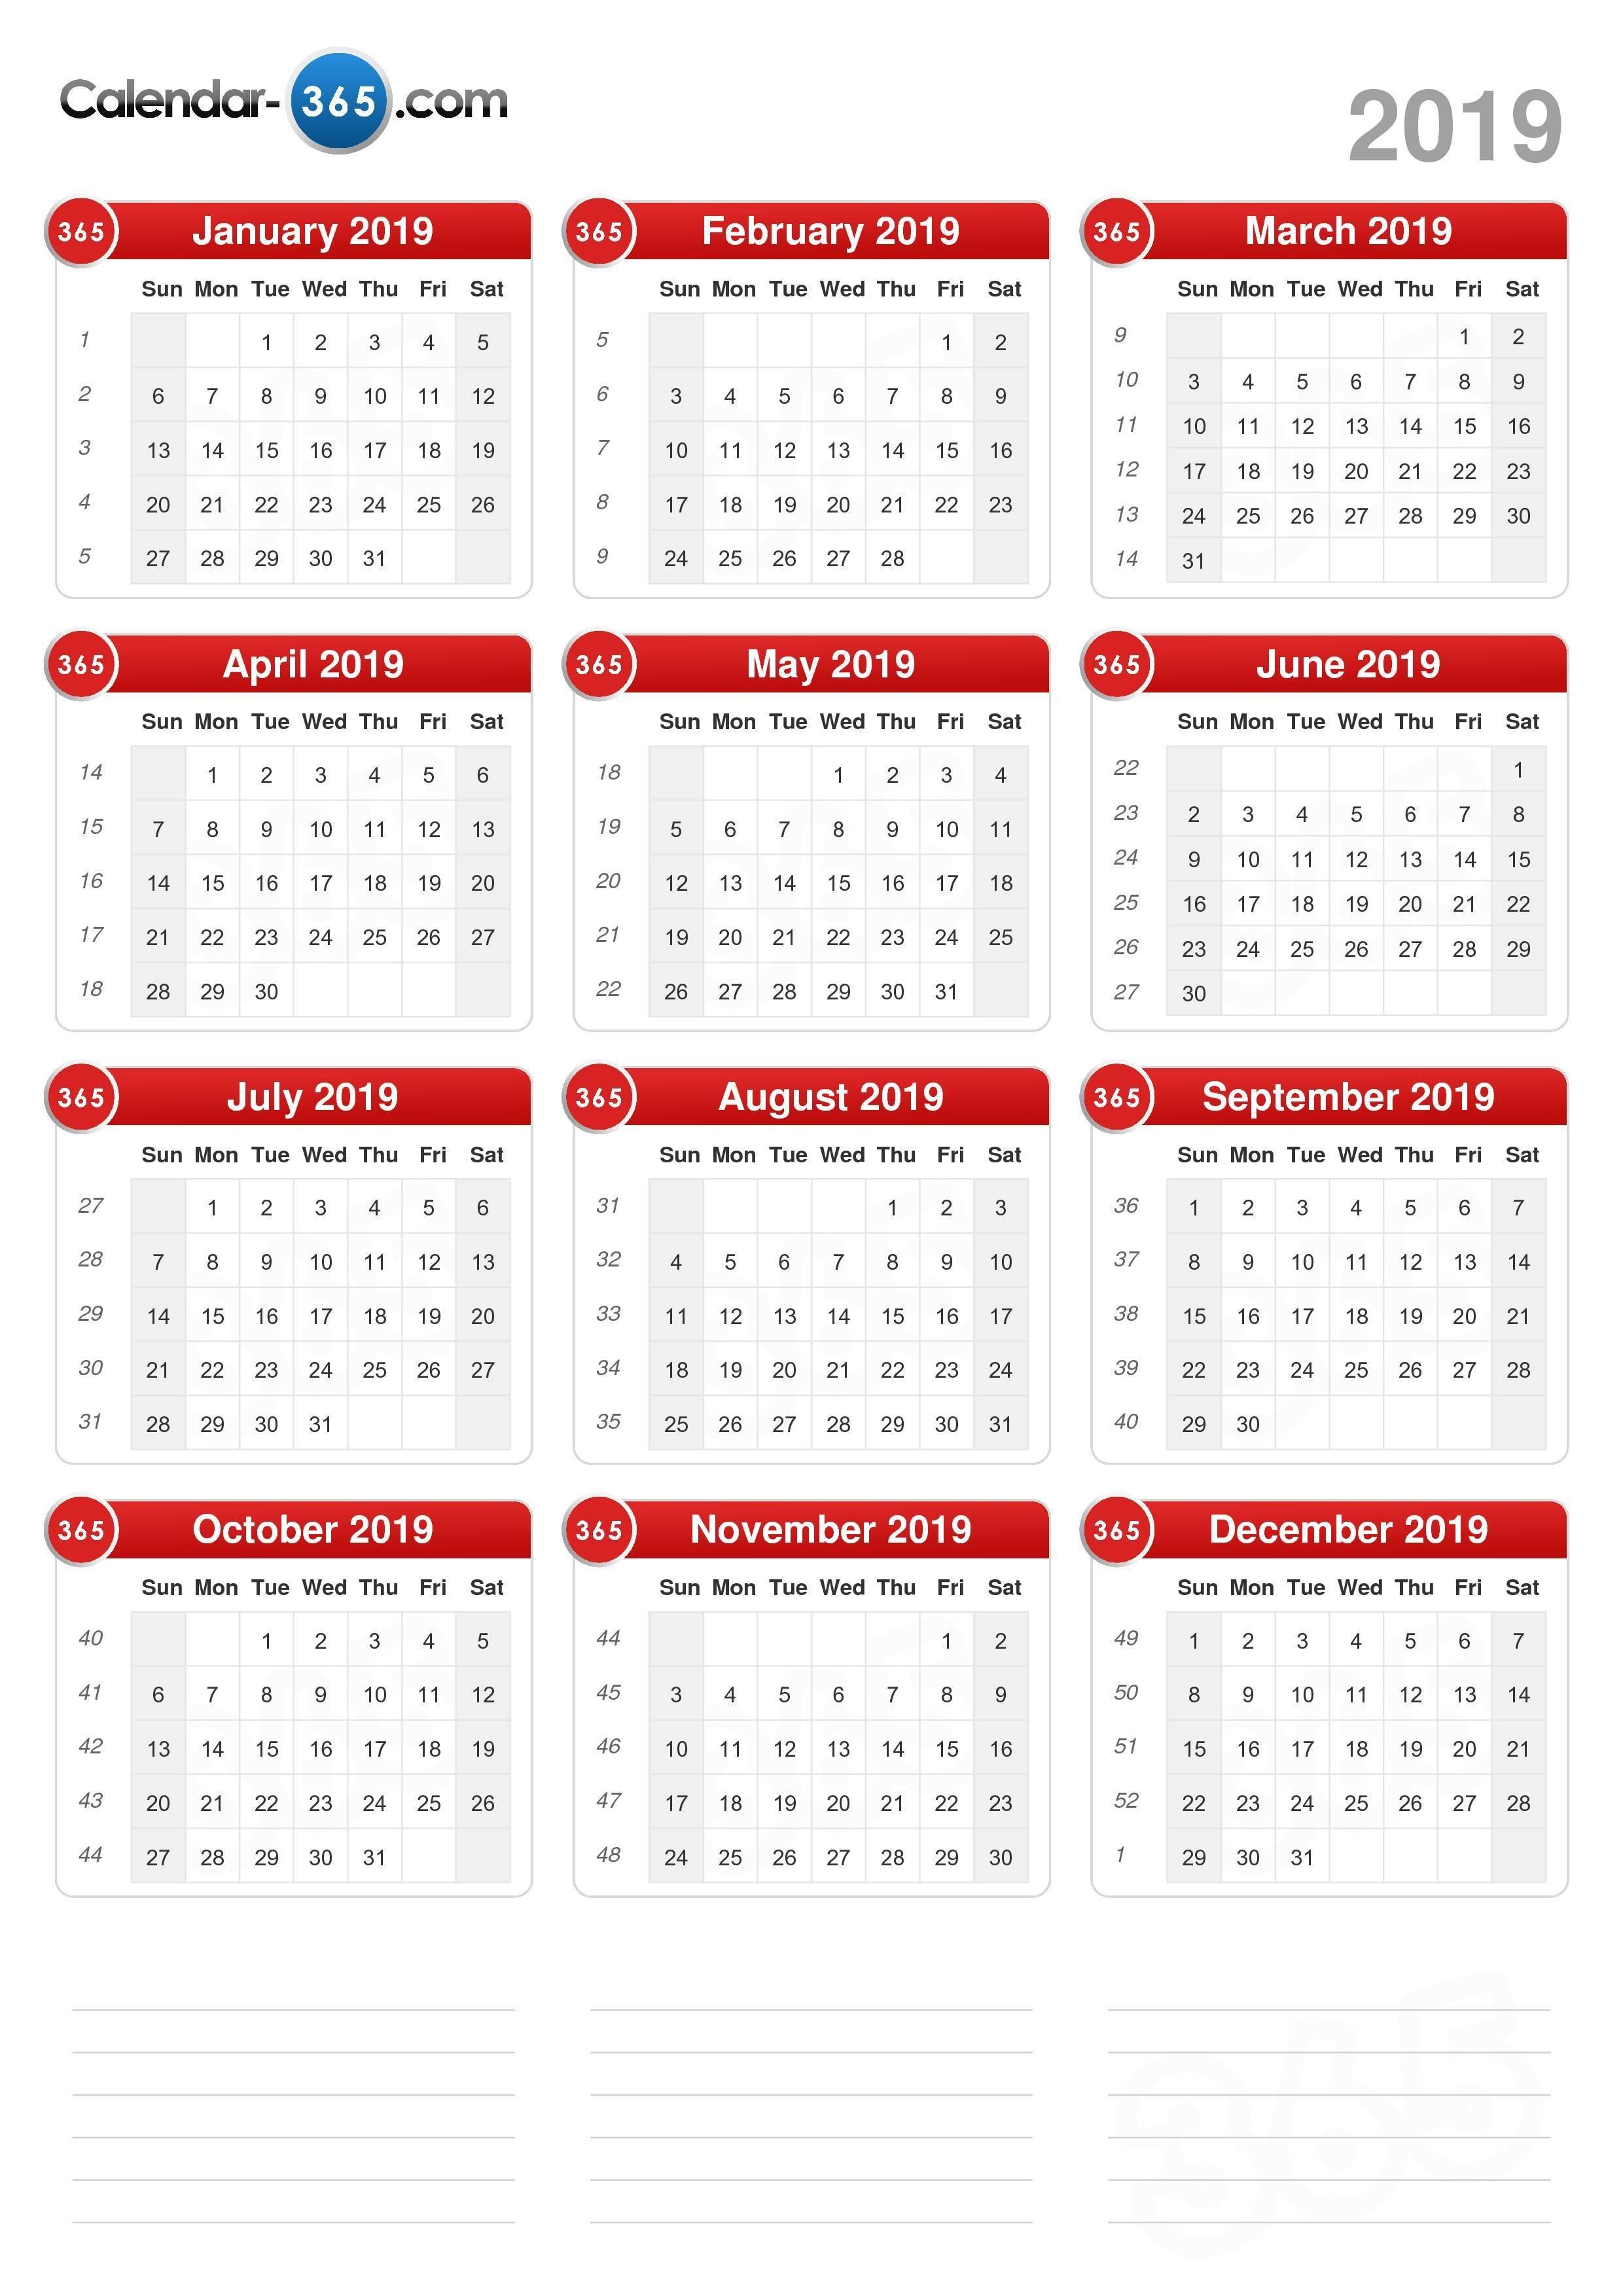 2019 Calendar Calendar 2019 Entire Year